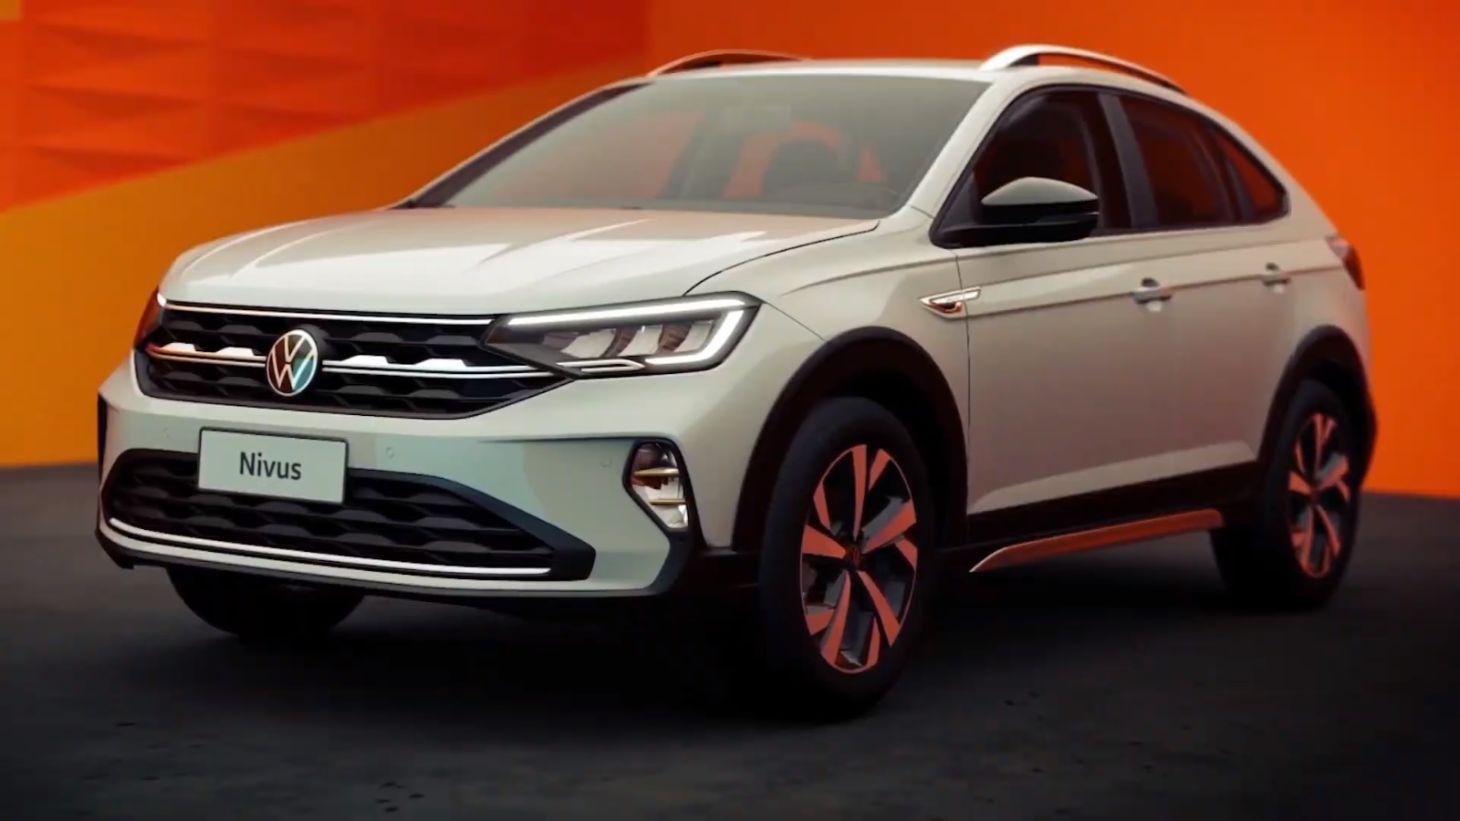 Frente do Volkswagen Nivus revelada na cor branca em detalhe